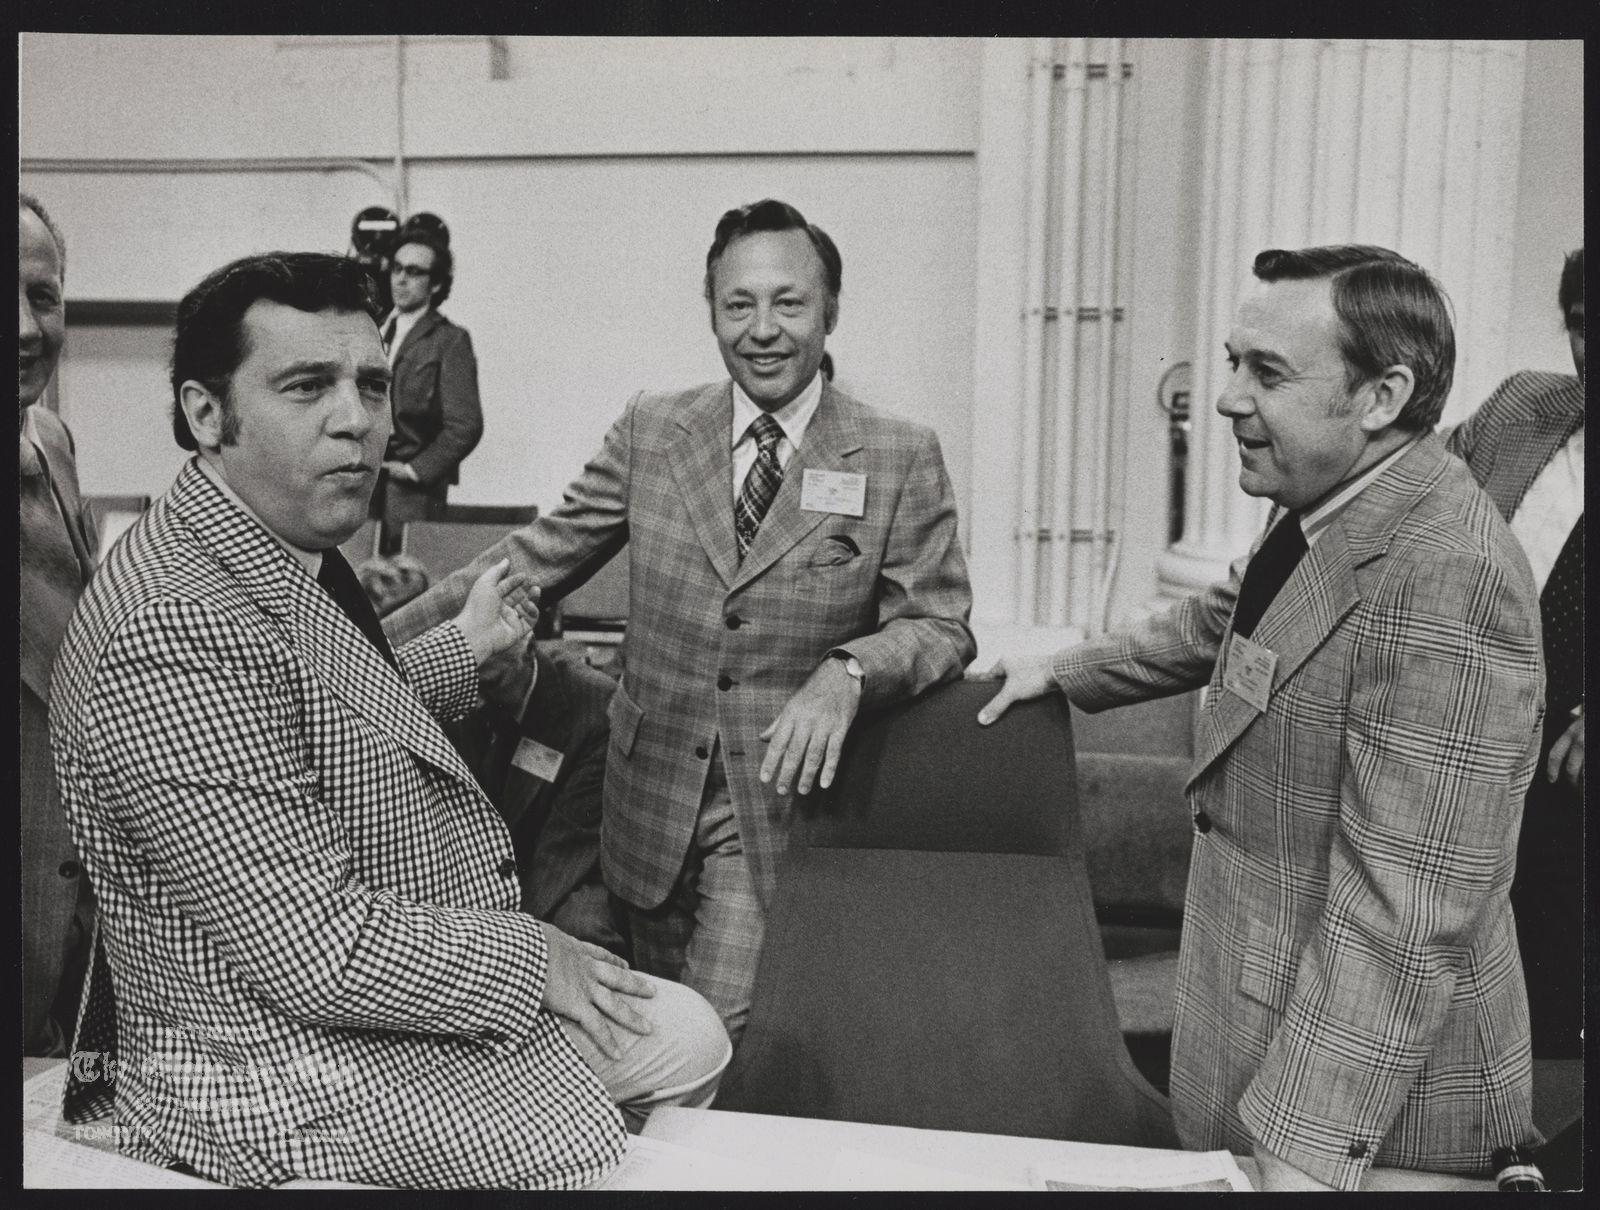 FEDERAL PROVINCIAL PRIME MINISTER CONFERENCES (Premier David Barrett, B.C. (left); Hon. J.A. Richardson, B.C.,; and Premier Allan Blakeney, Sask. during federal provincial conference in Ottawa. )